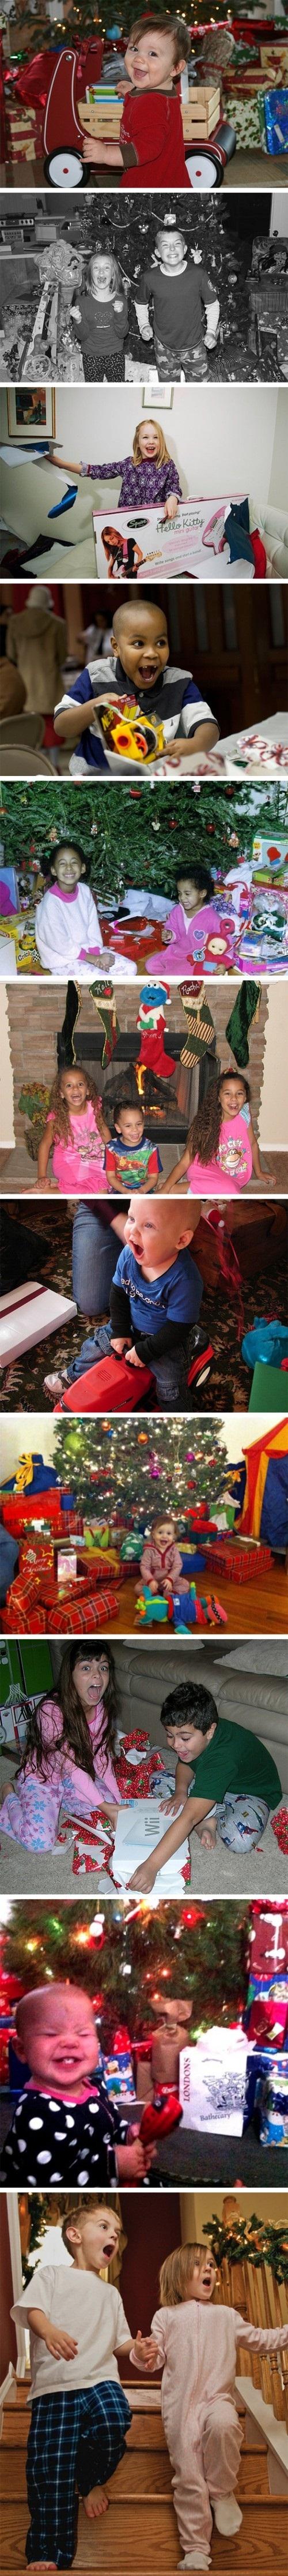 Santa got it really right